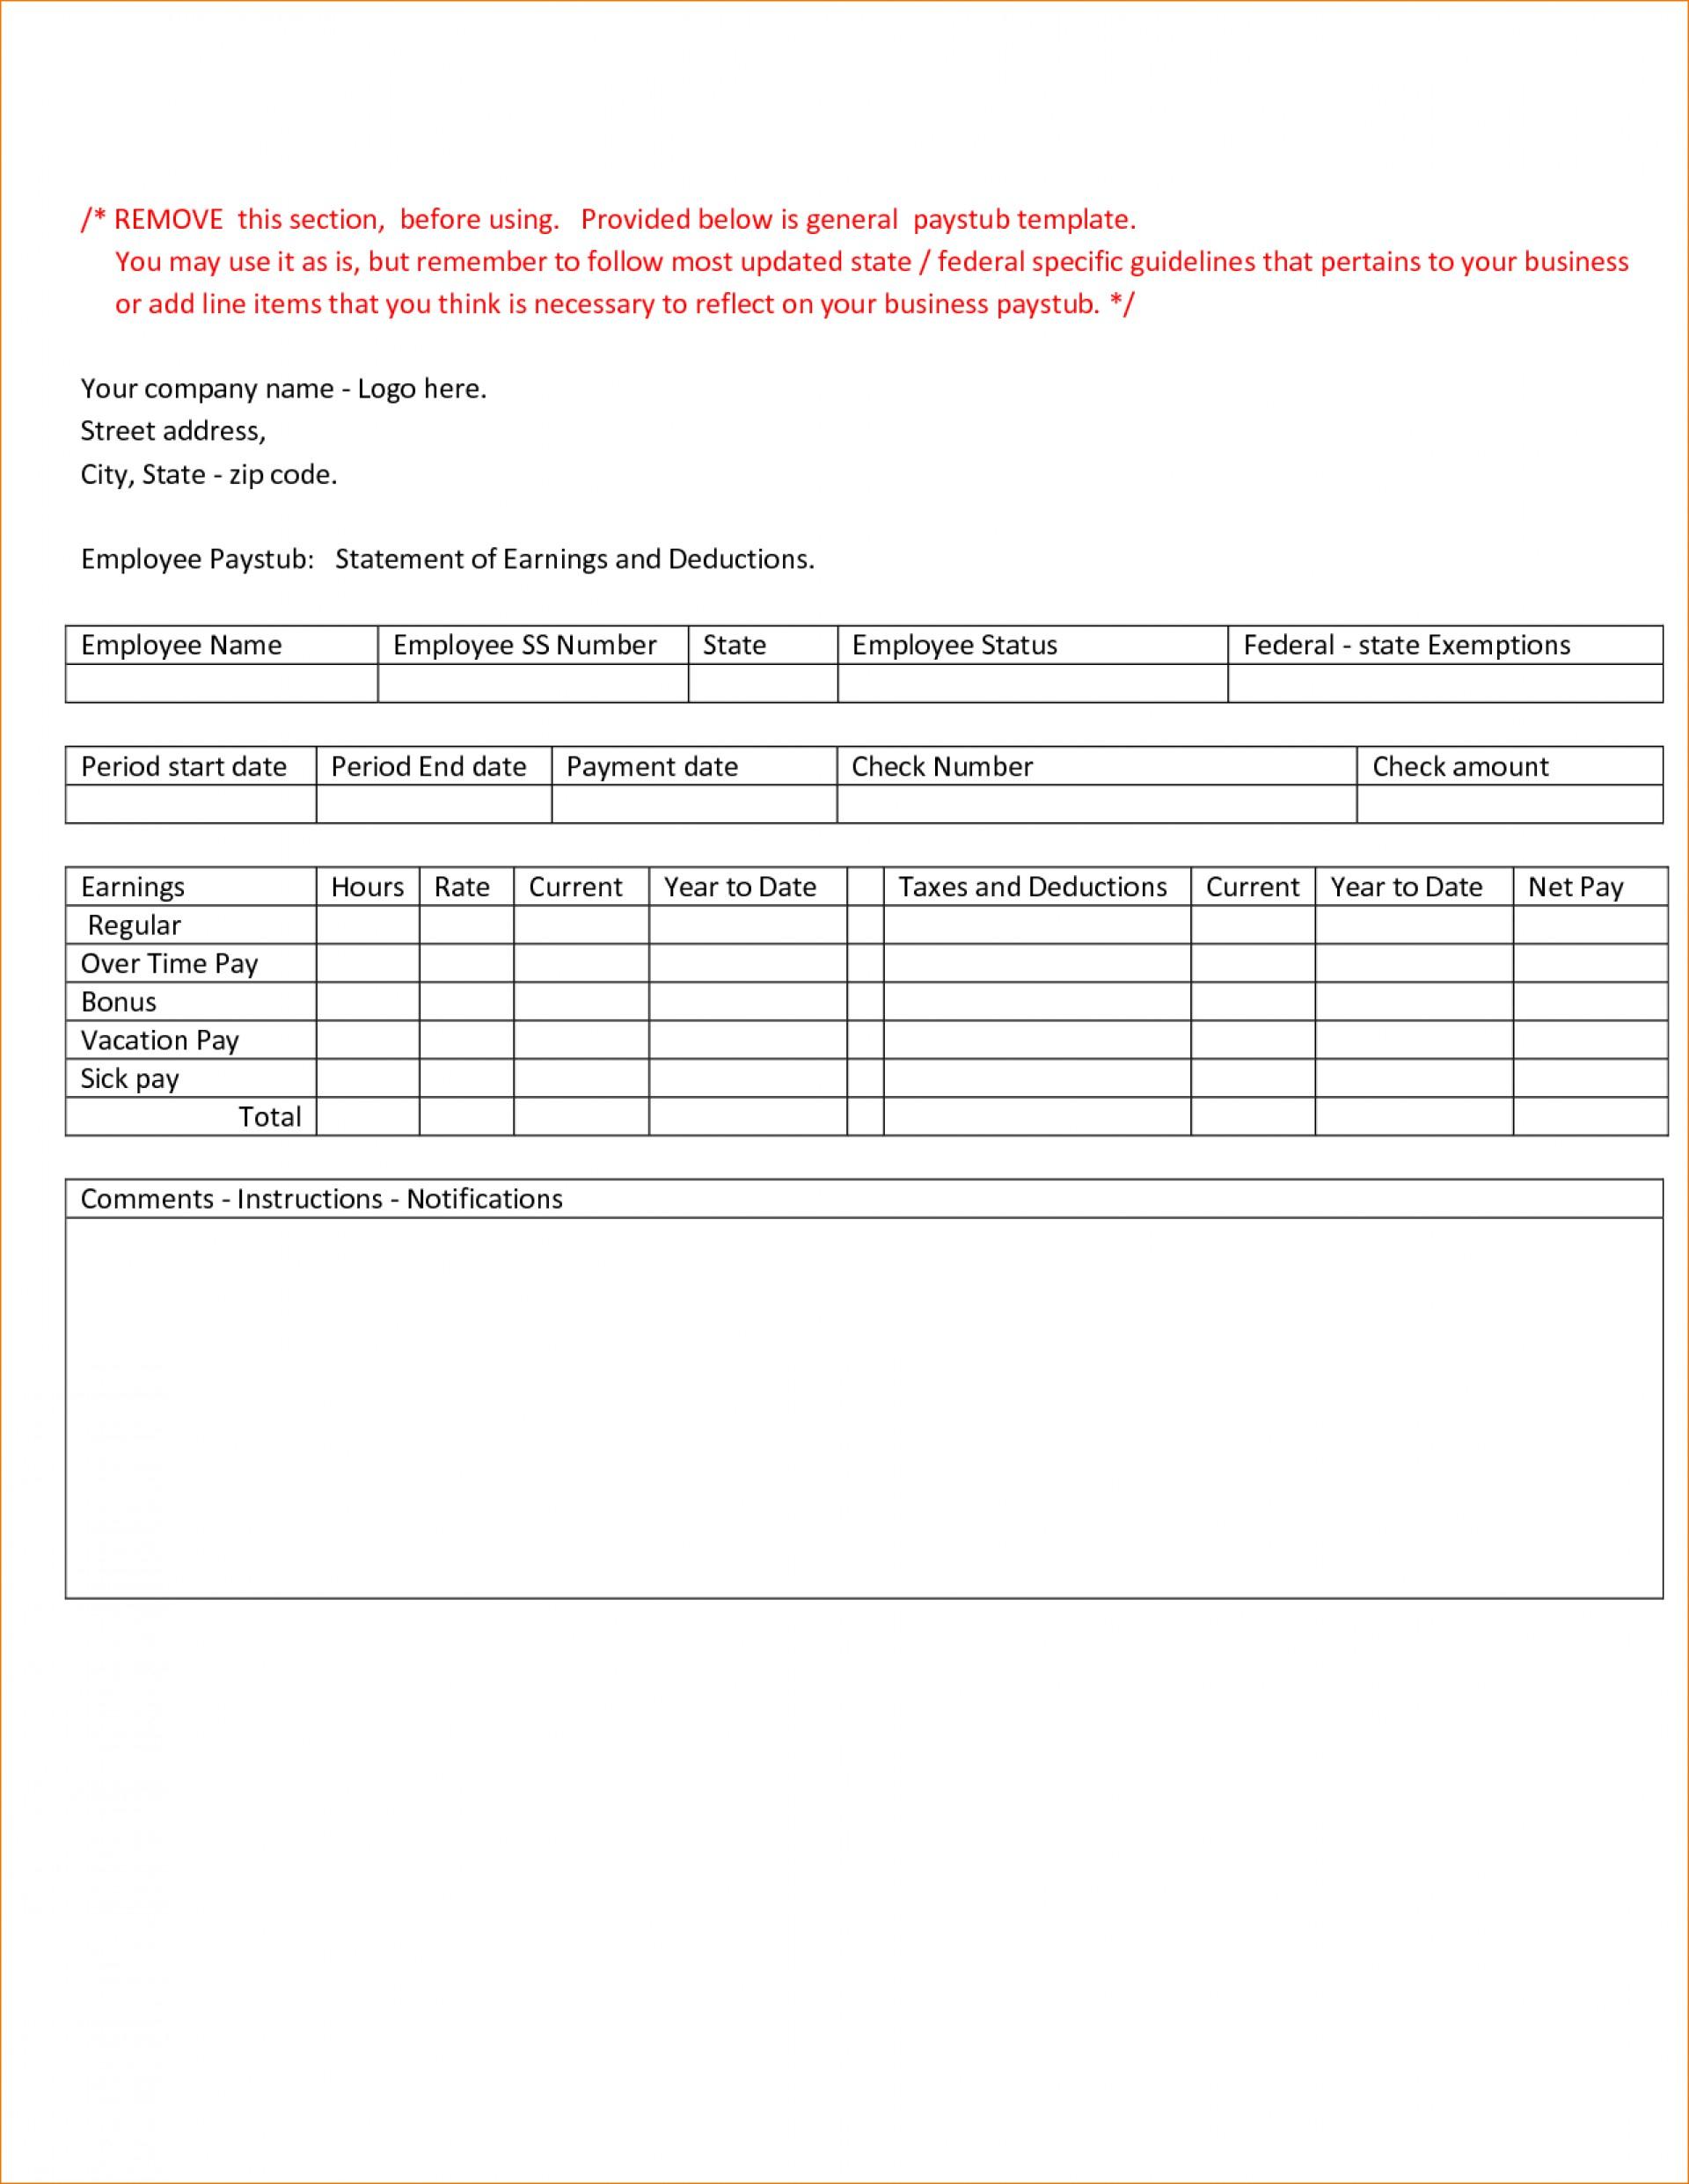 019 Printable Pay Stub Template Free Payroll ~ Ulyssesroom - Printable Pay Stub Template Free